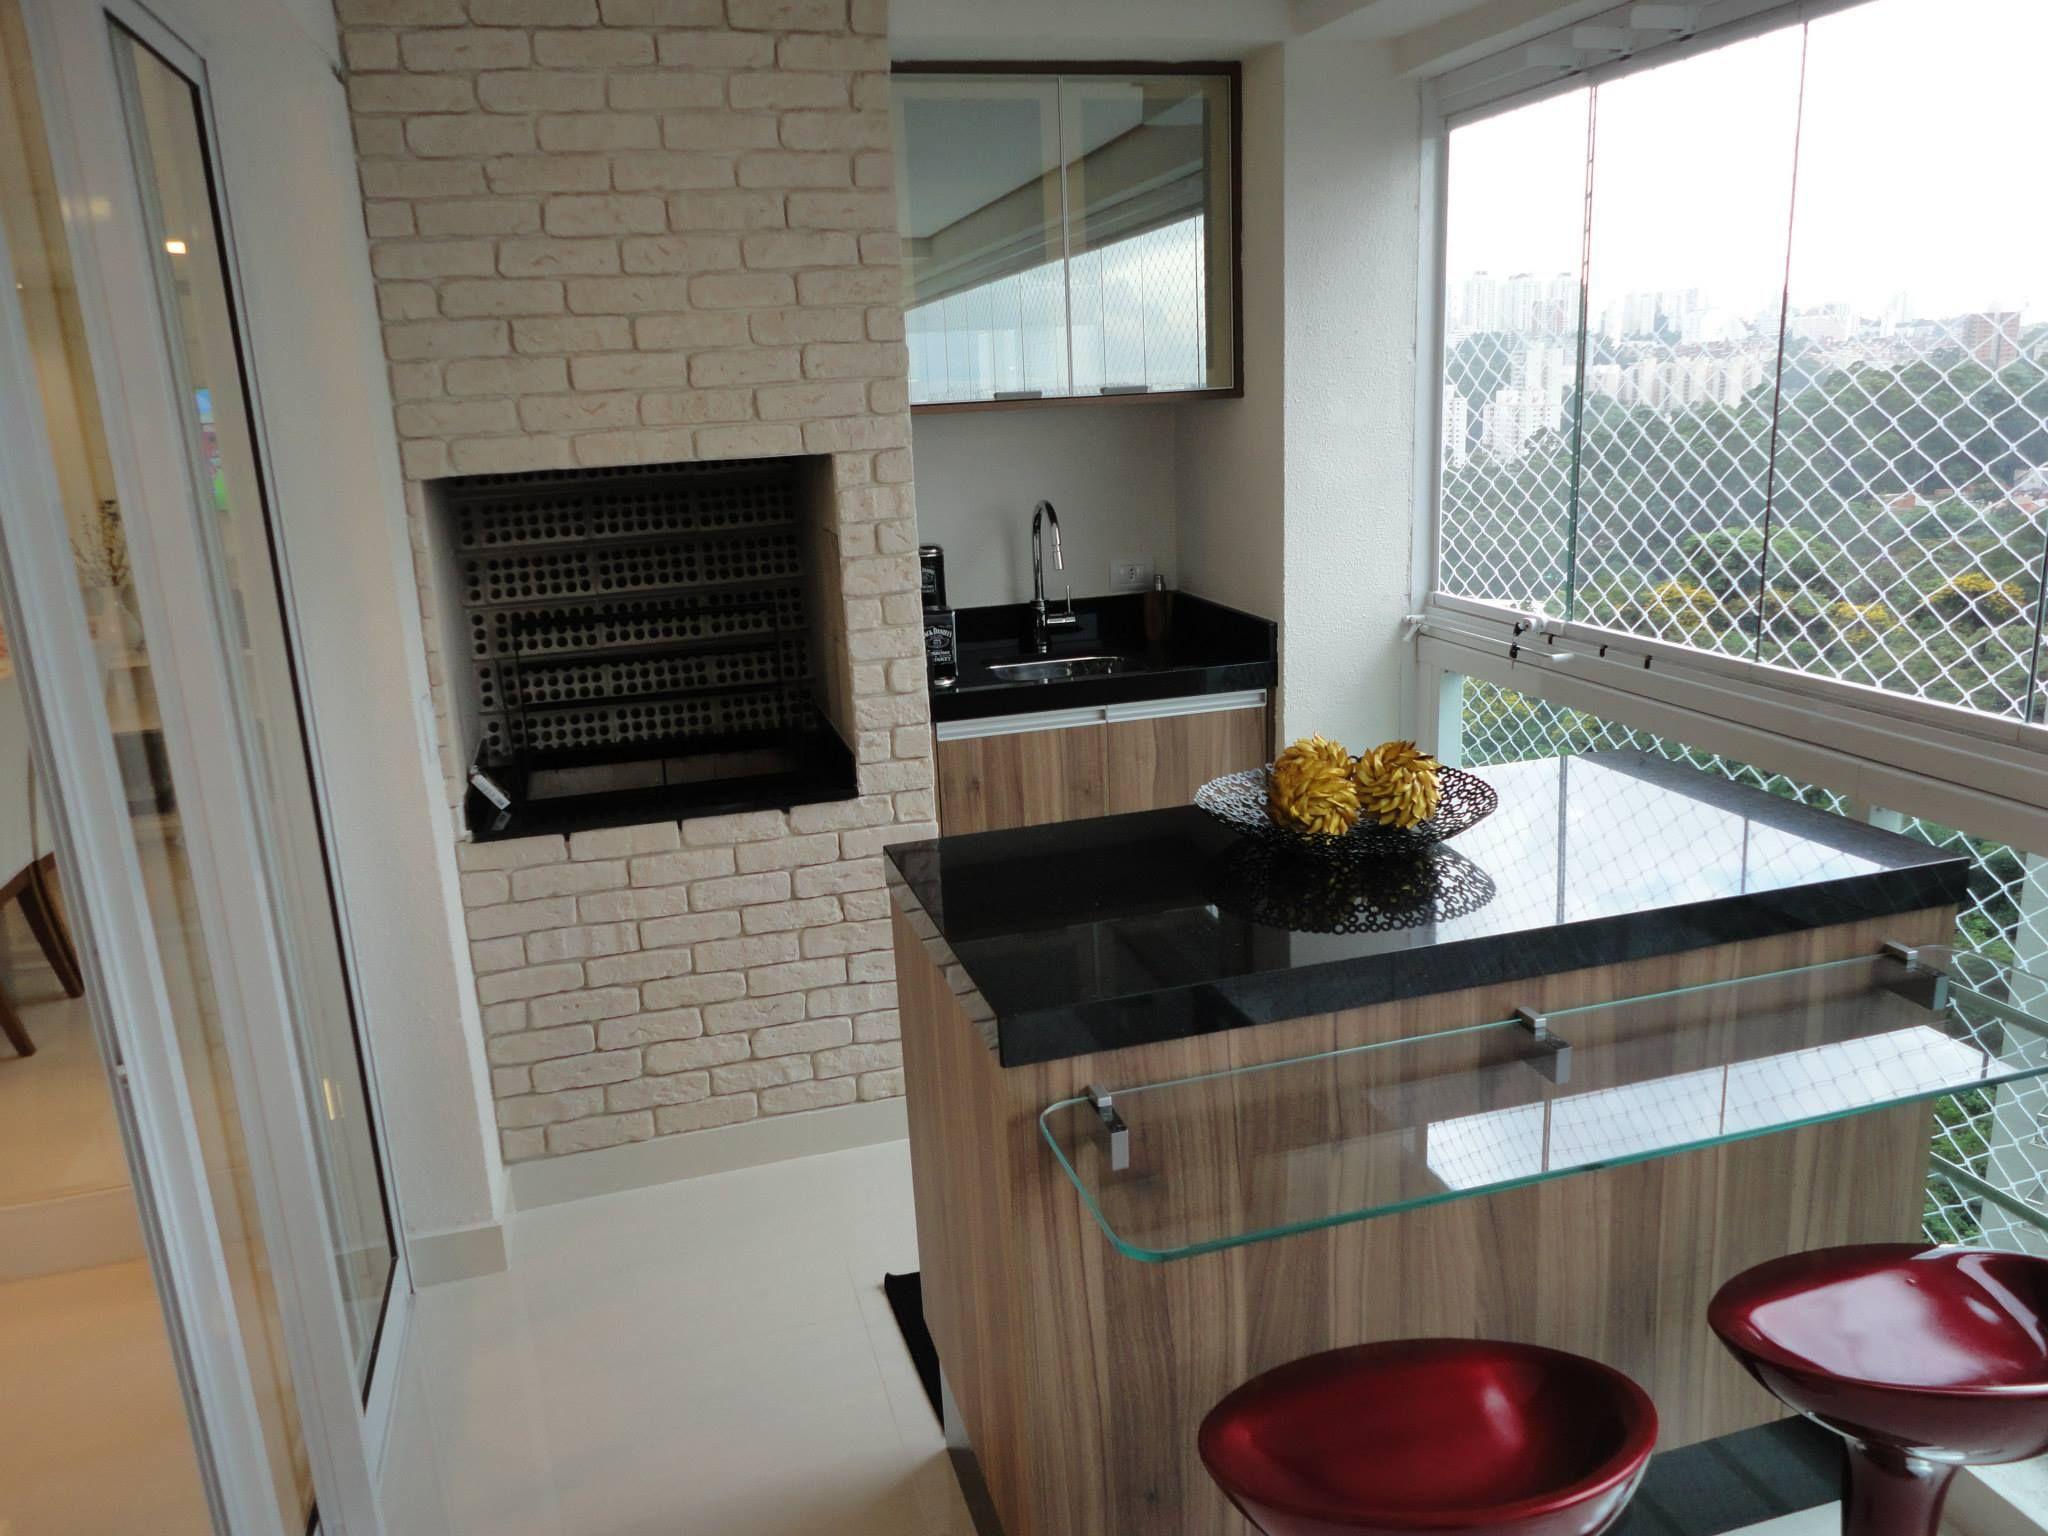 Sala Varanda E Cozinha - Marcenaria Design Interiores Casa Reformas Designdeinteriores